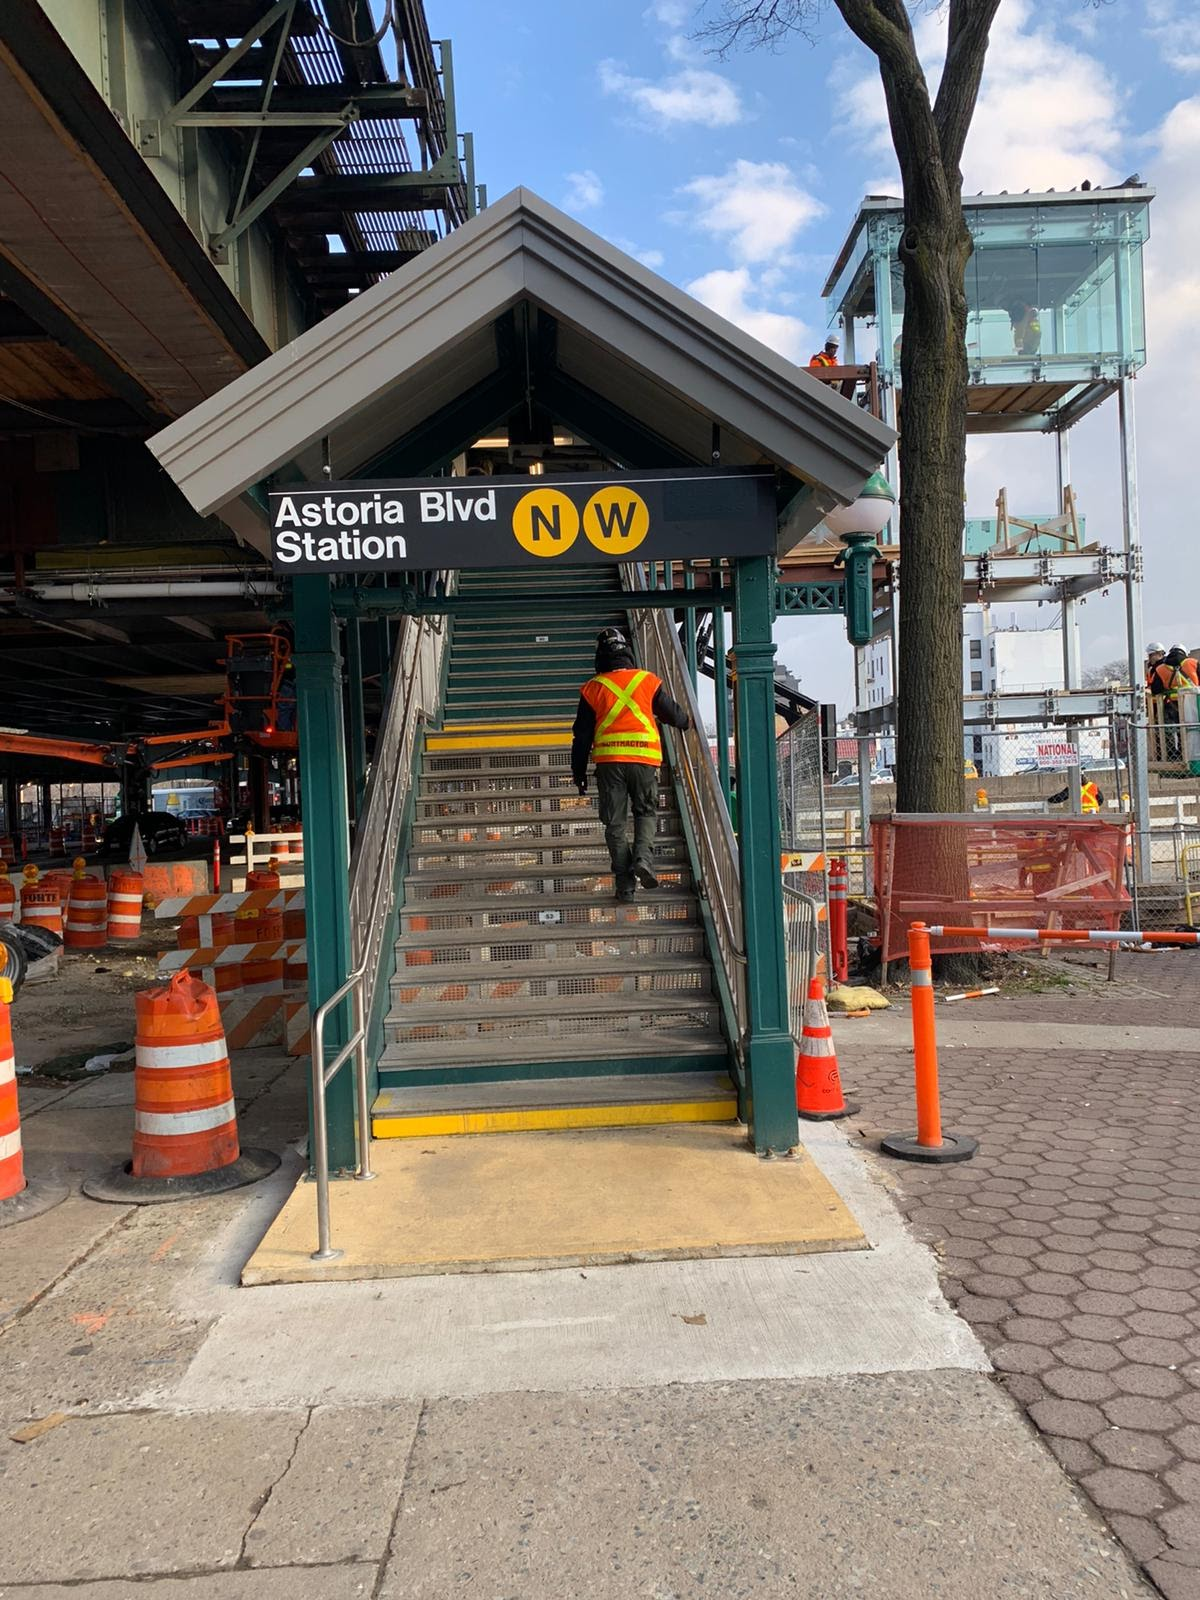 Astoria Blvd Station